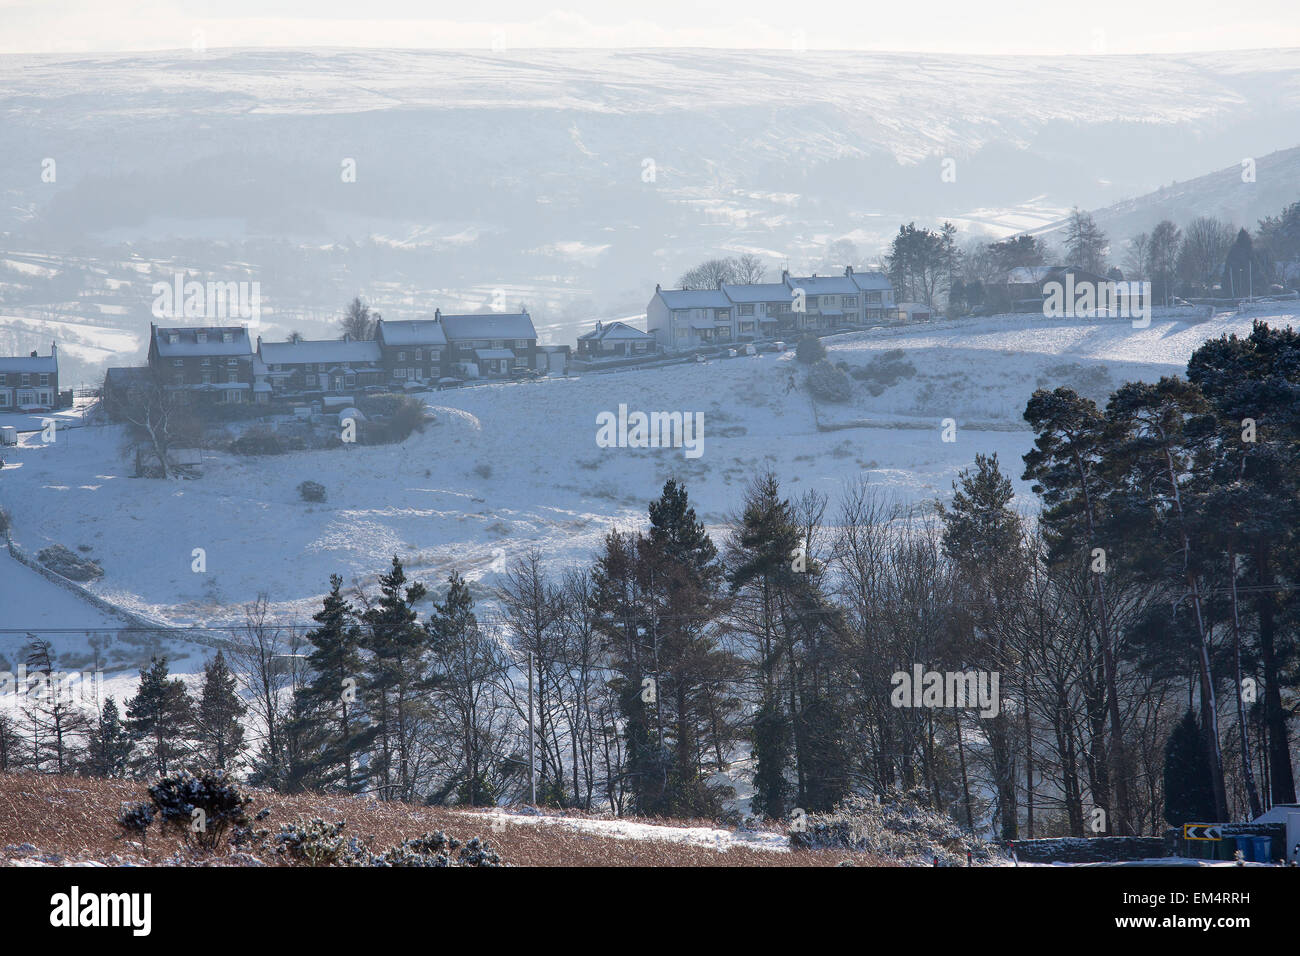 Castleton, North York Moors National Park in Winter Snow - Stock Image